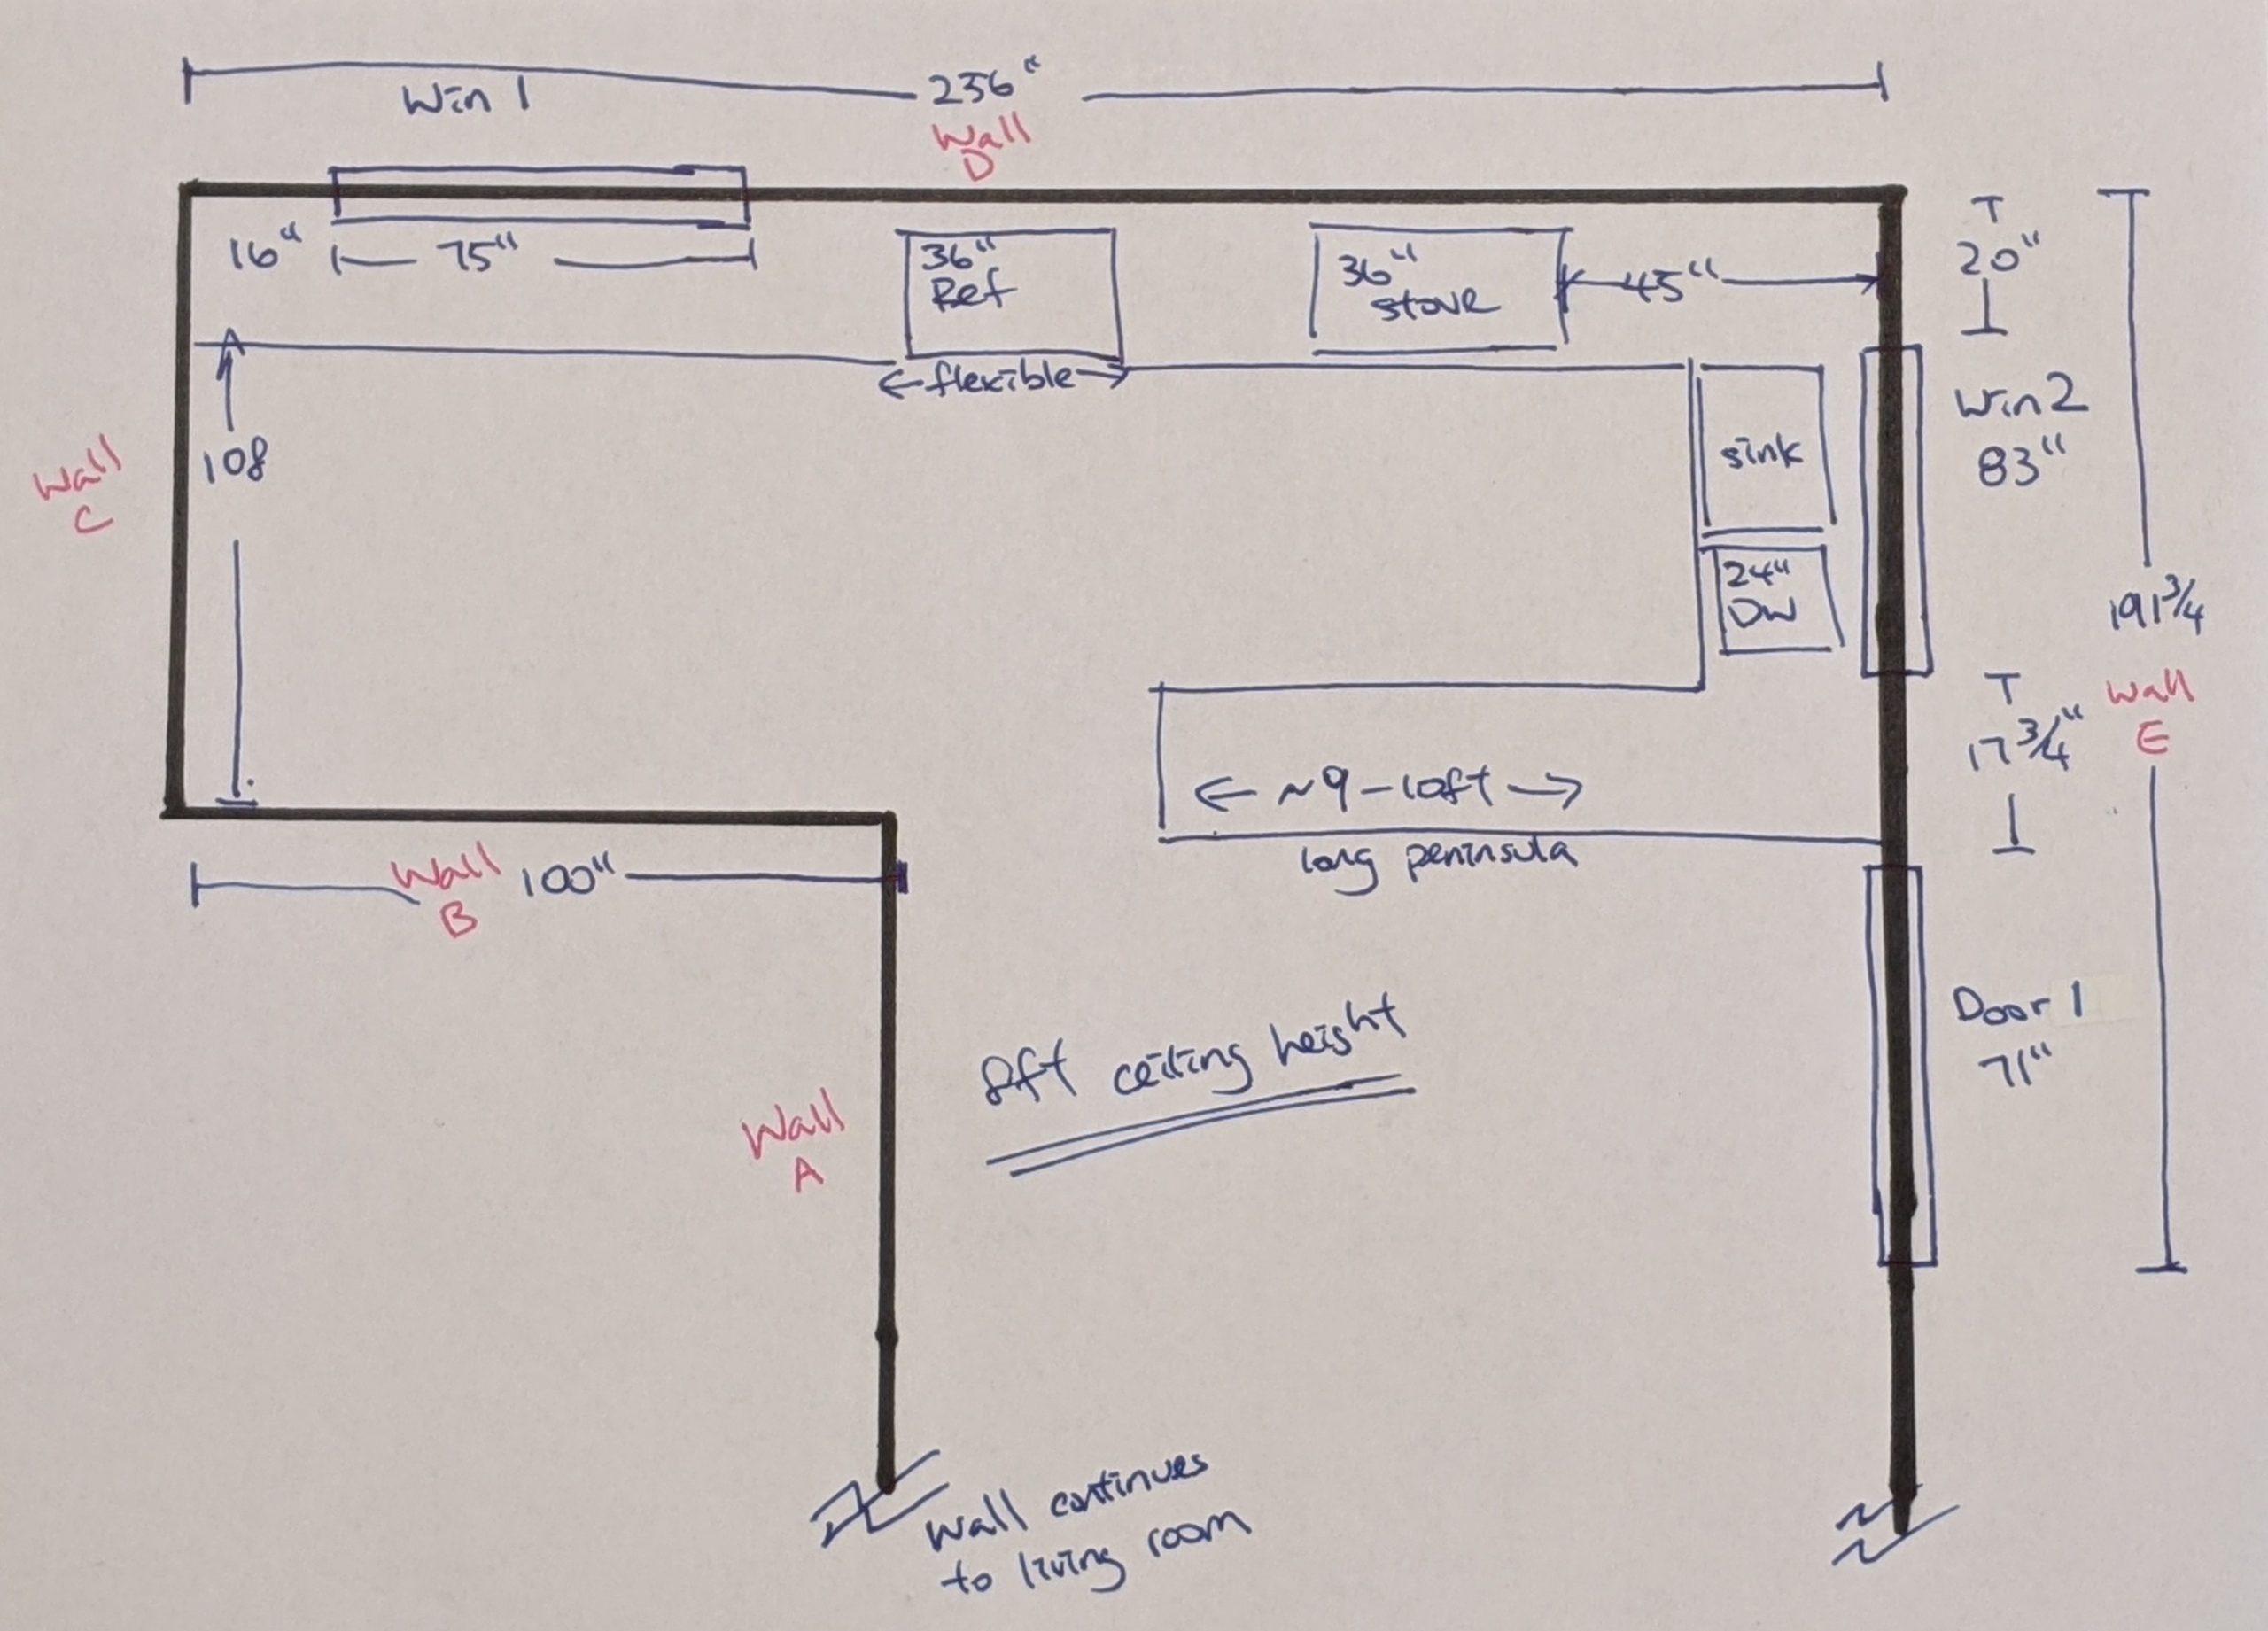 A hand sketch floor plan with measurements